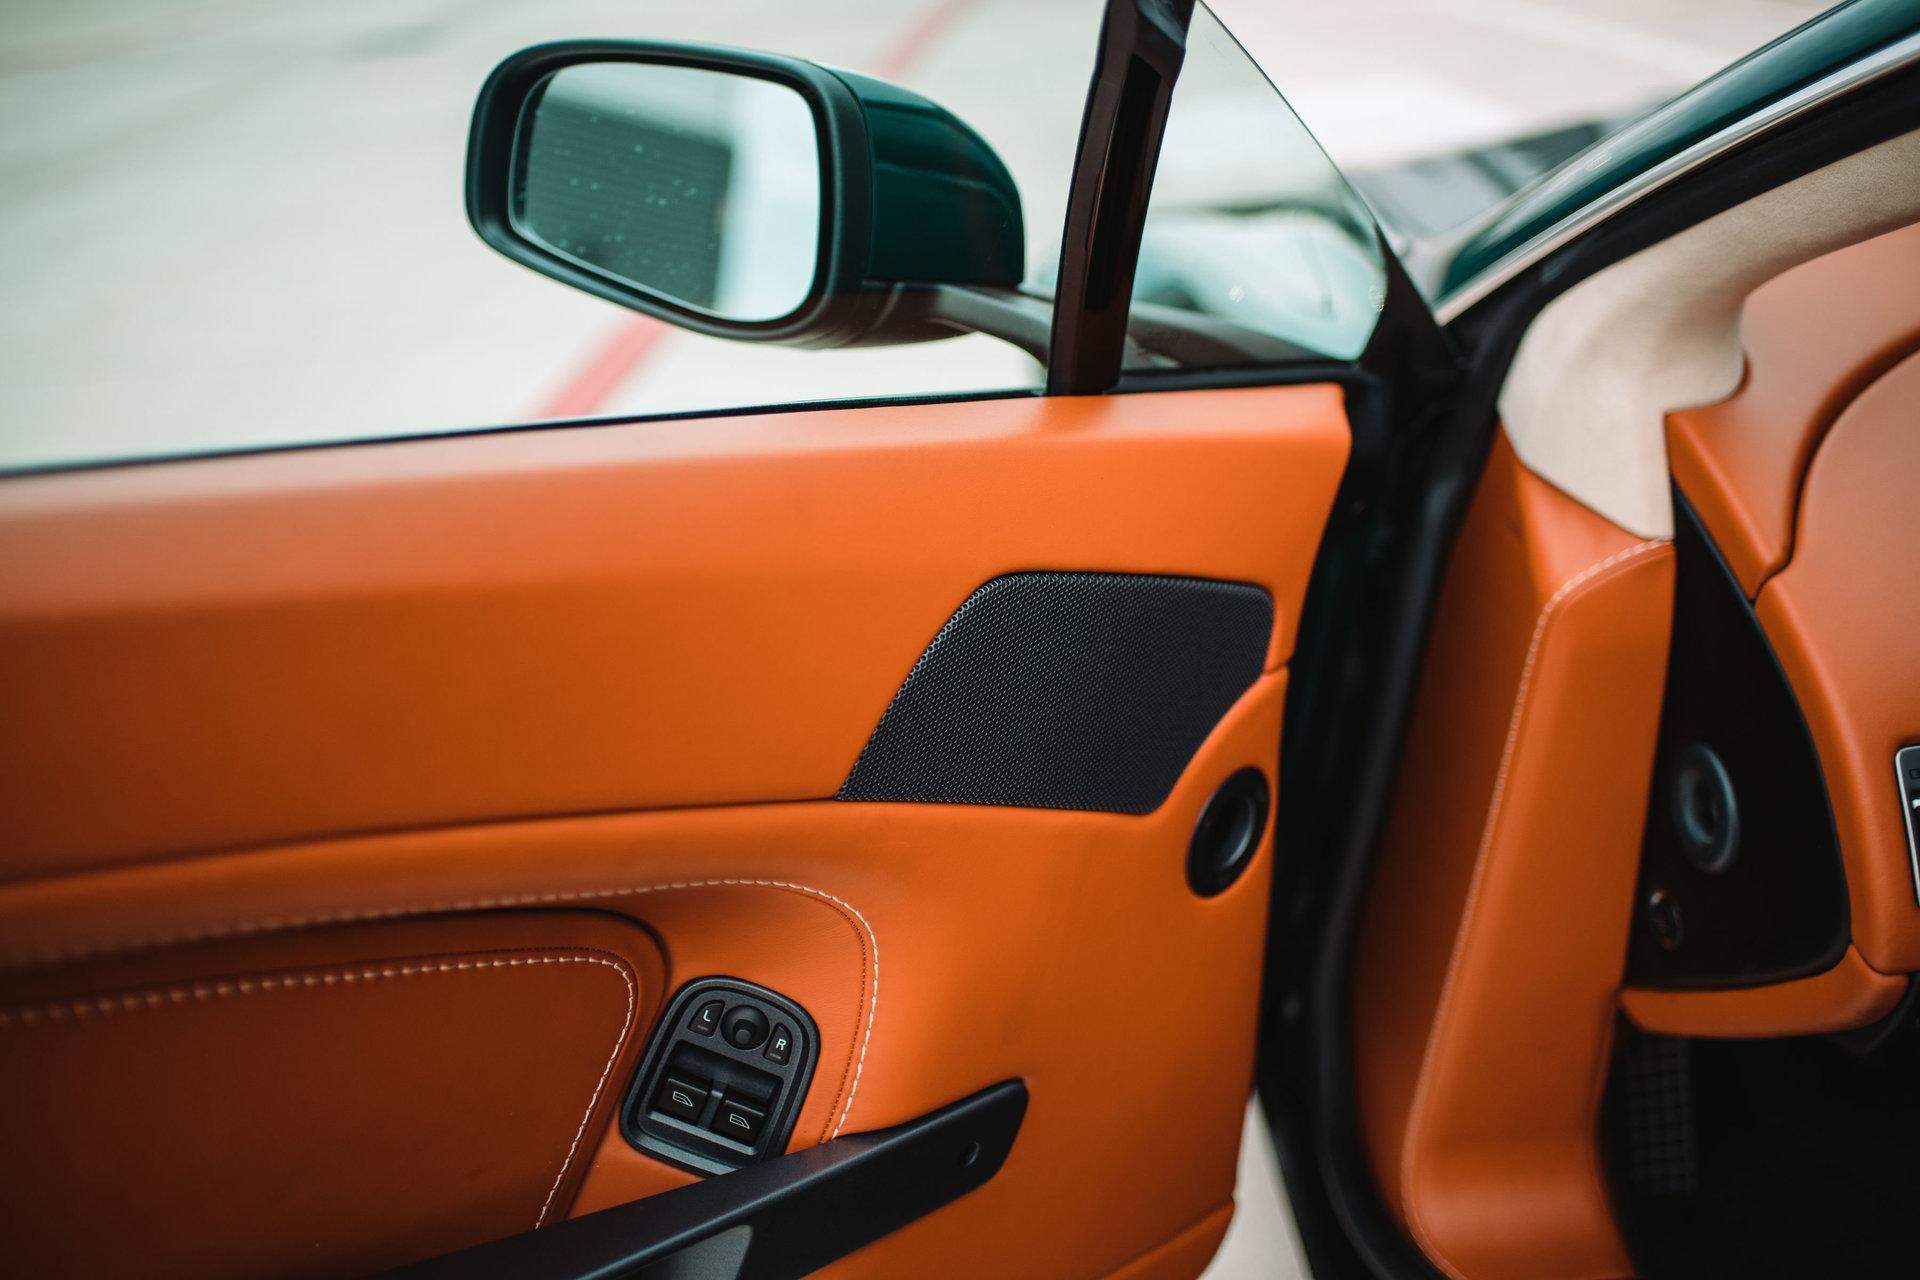 2007 Aston Martin Vantage 2dr Cpe Manual for sale